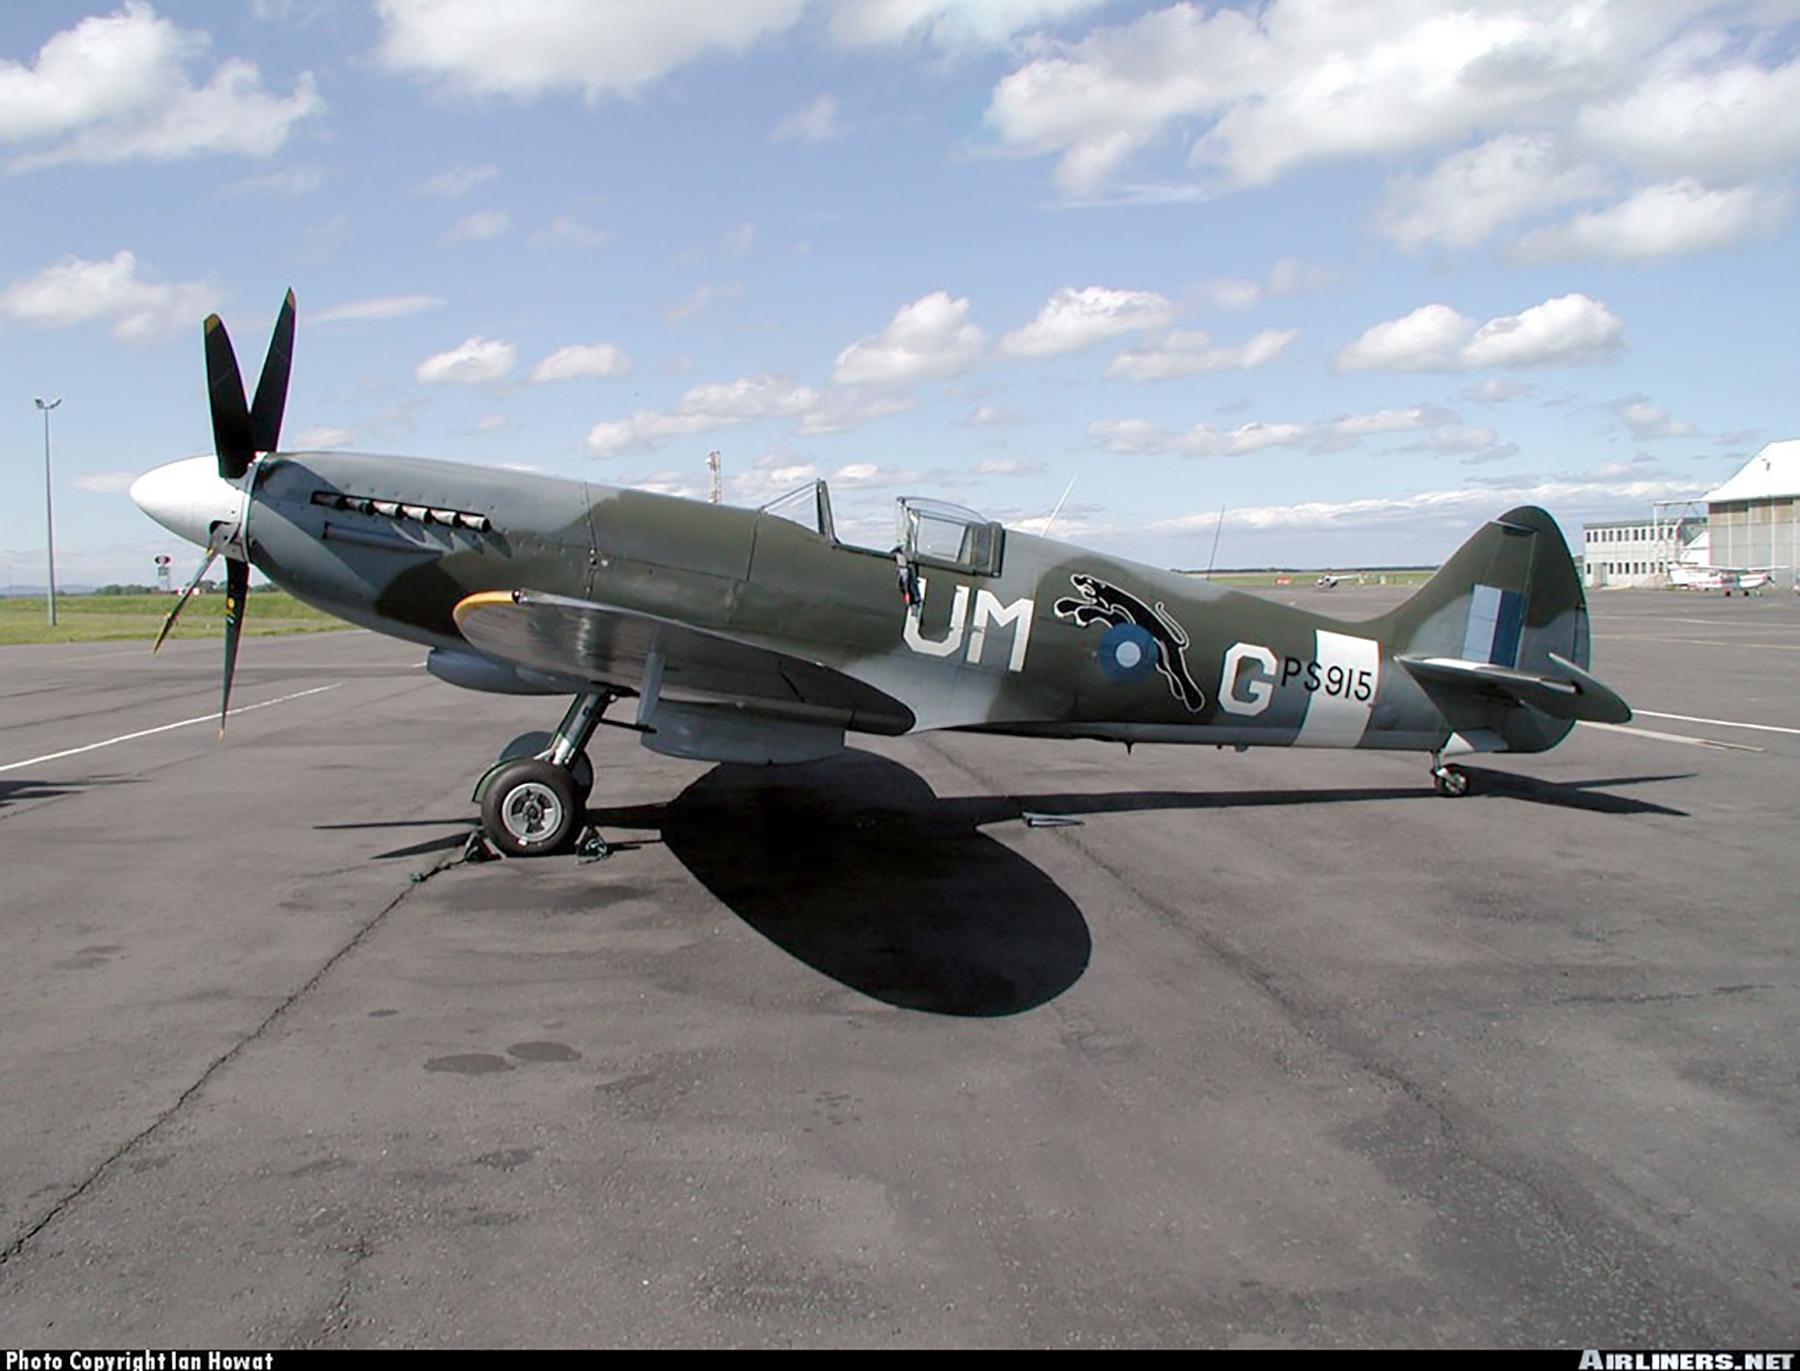 Airworthy Spitfire warbird PRXIX RAF 152Sqn UMG PS915 SEAC 1945 01